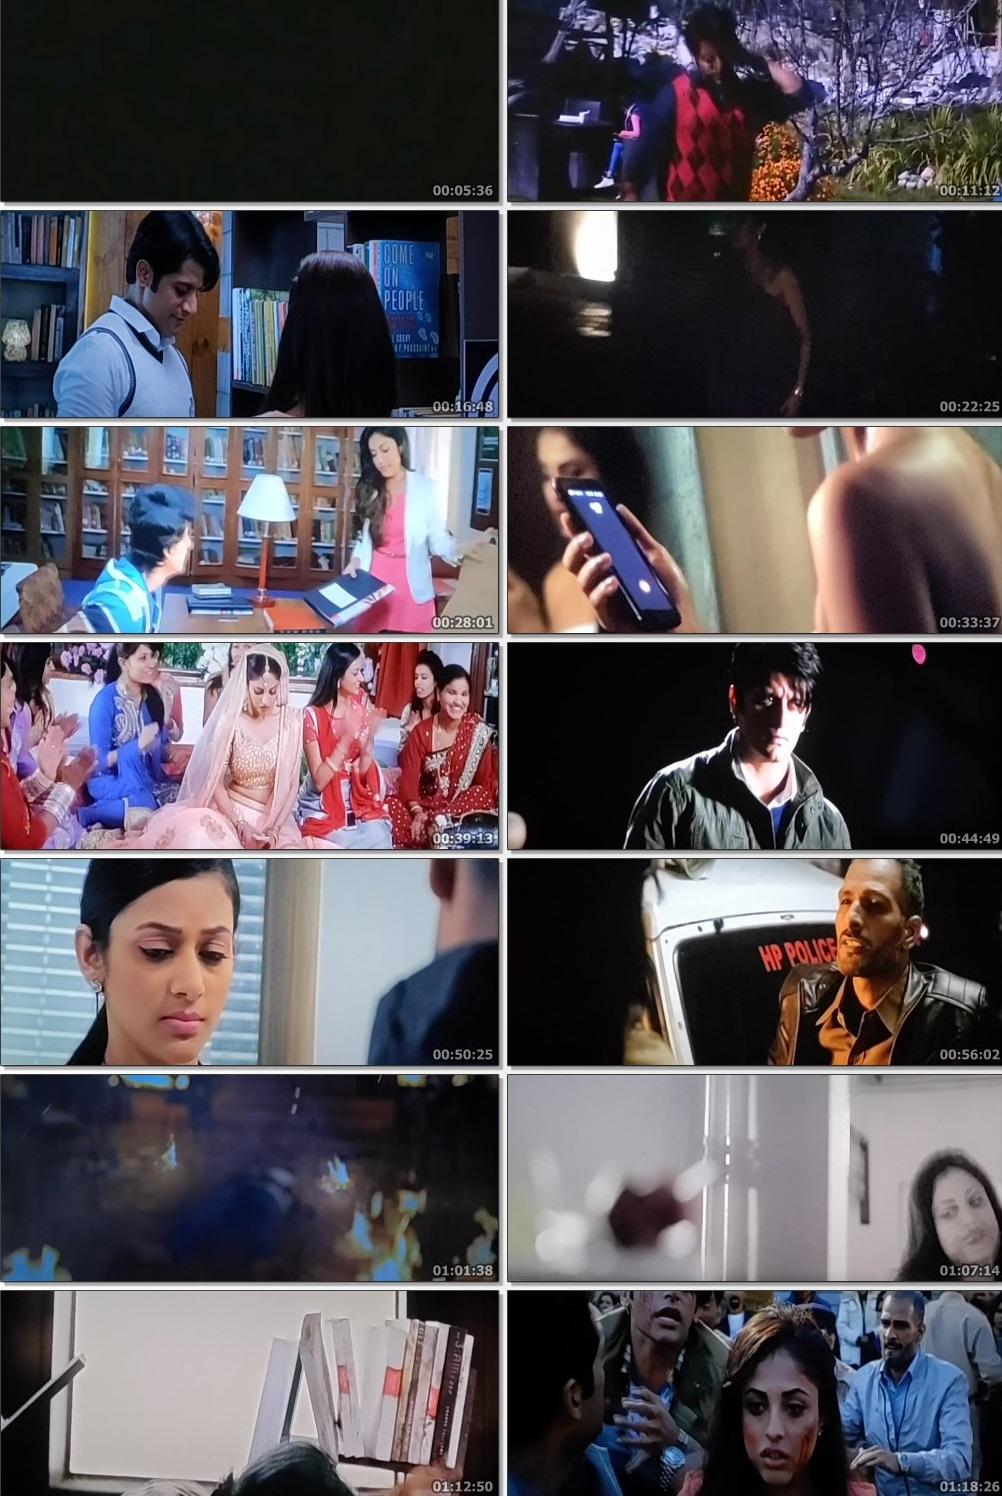 Hume%2BTumse%2BPyaar%2BKitna Hume Tumse Pyaar Kitna (2019) Movie Download 300MB 480P PDVD